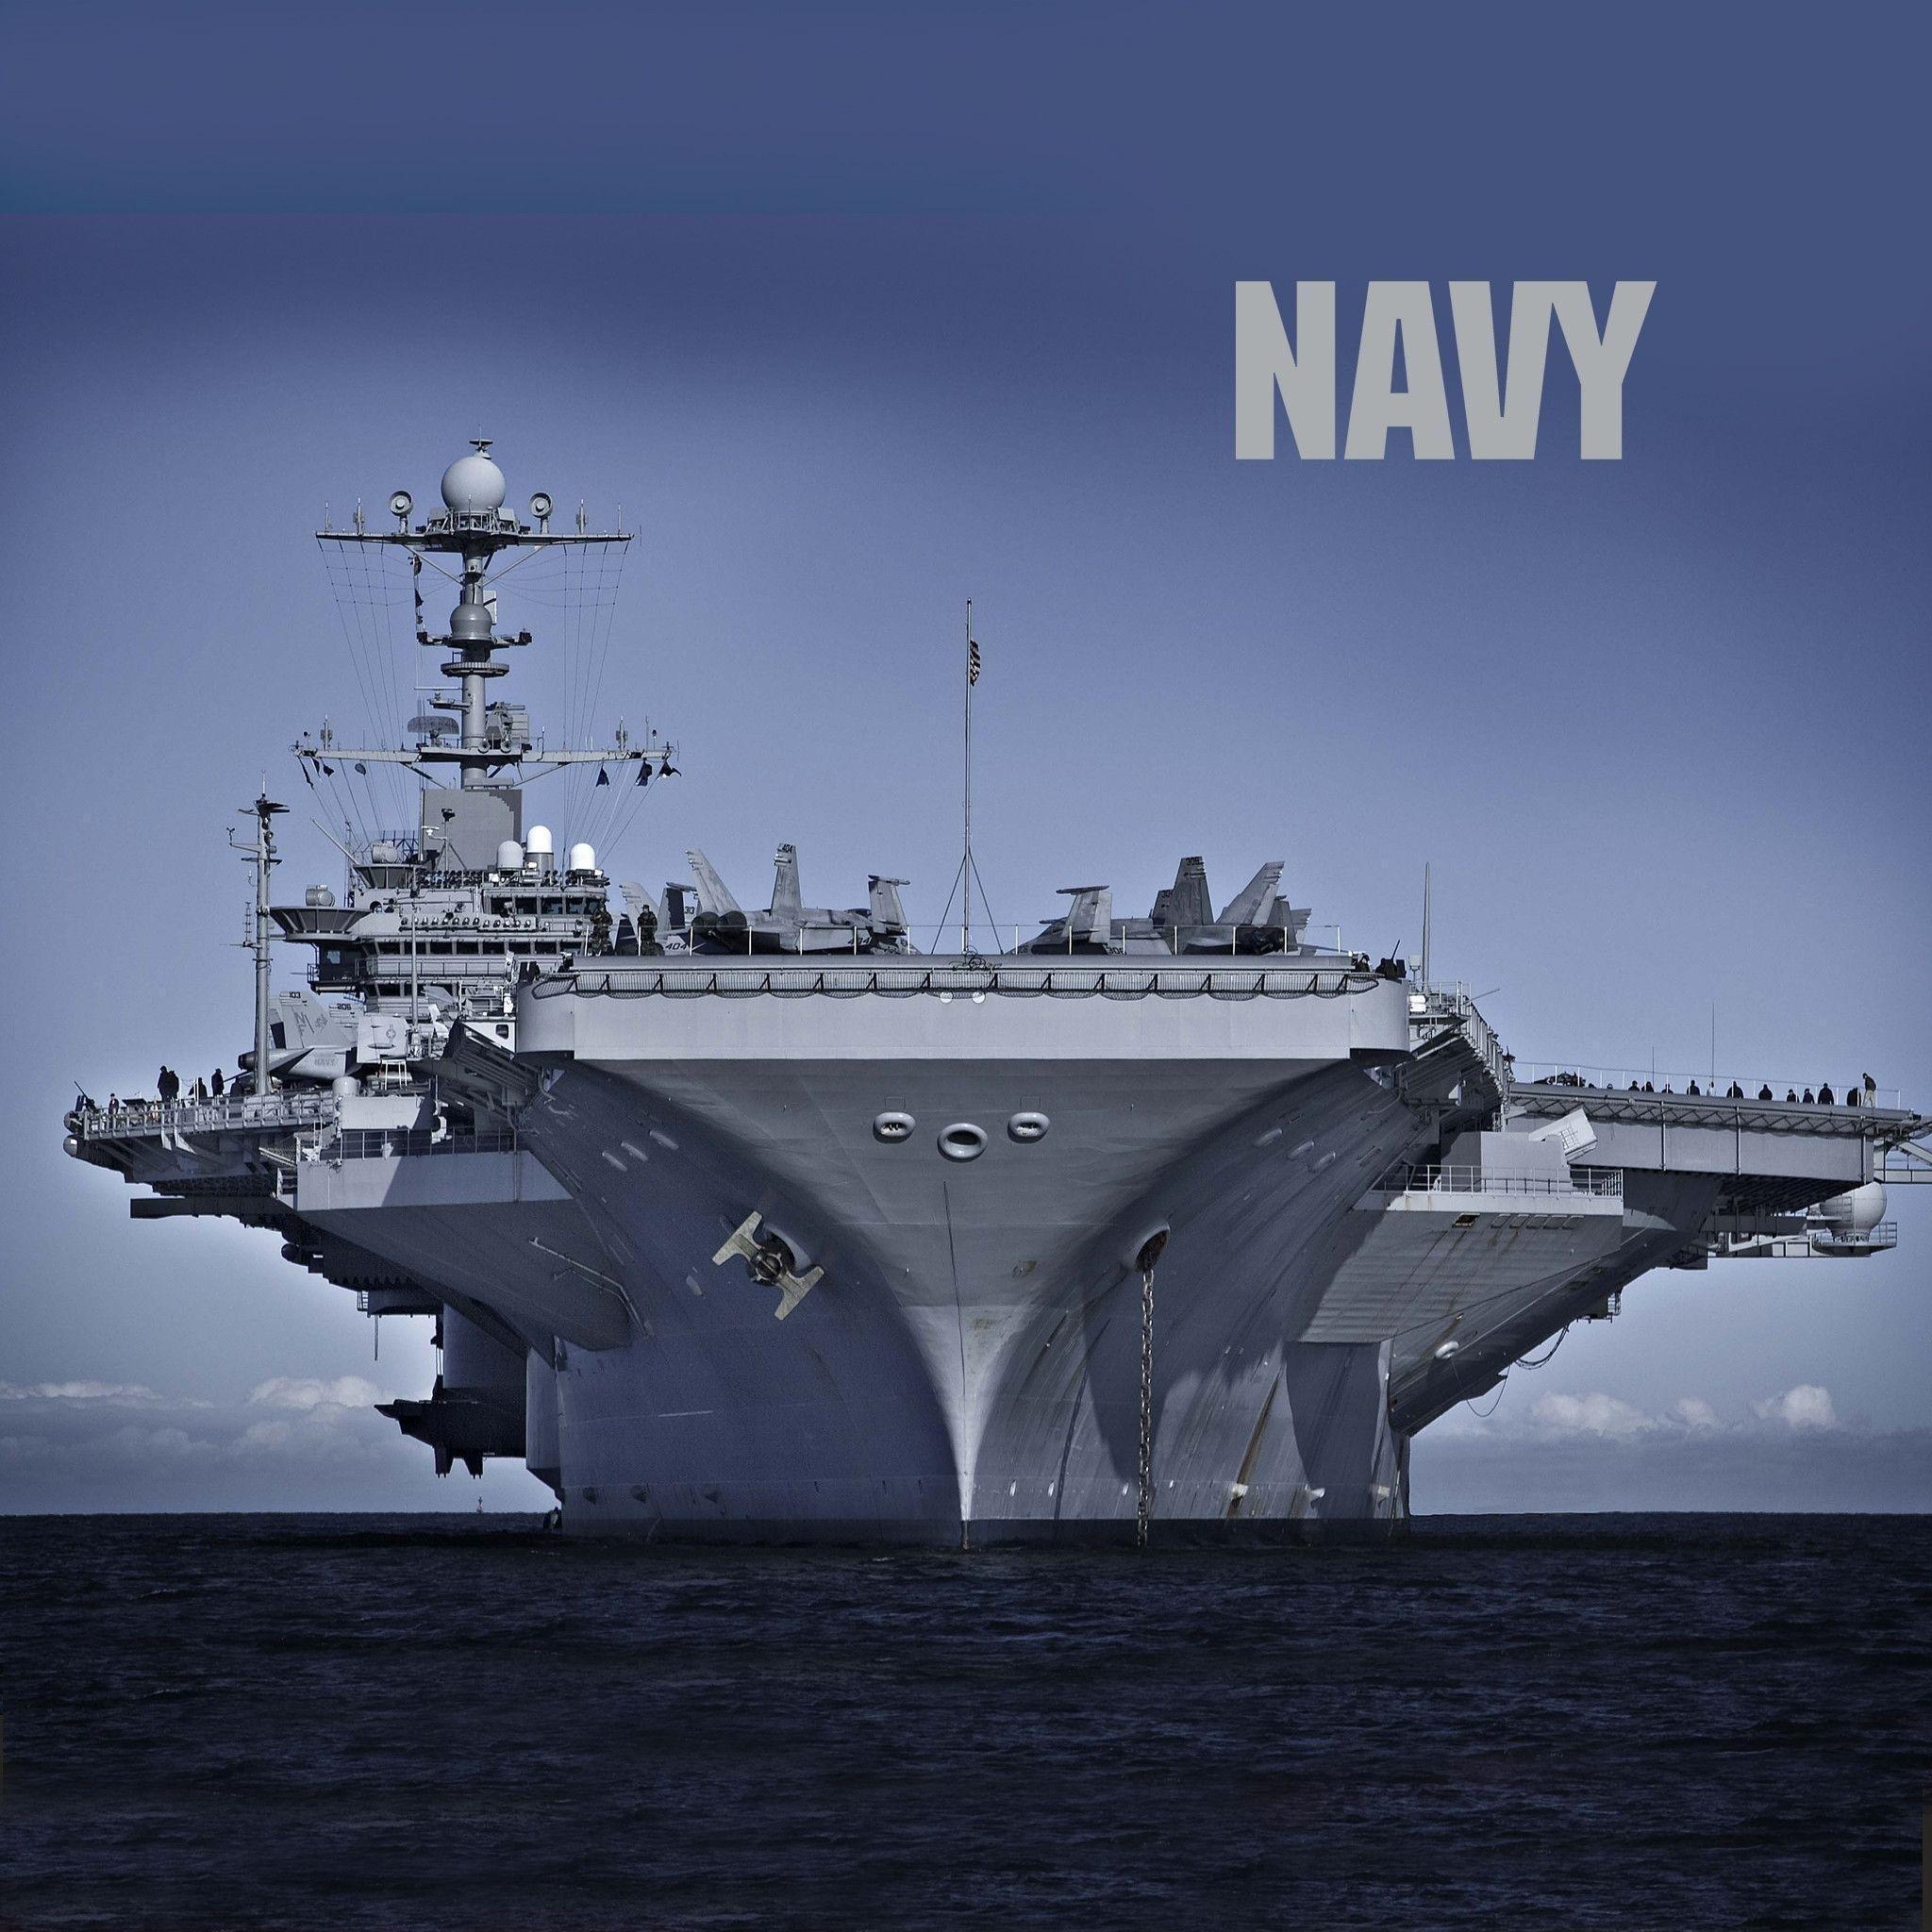 10 most popular us navy desktop wallpaper full hd 19201080 for pc title us navy images logo wallpaper 54 images dimension 2048 x 2048 file type jpgjpeg altavistaventures Image collections